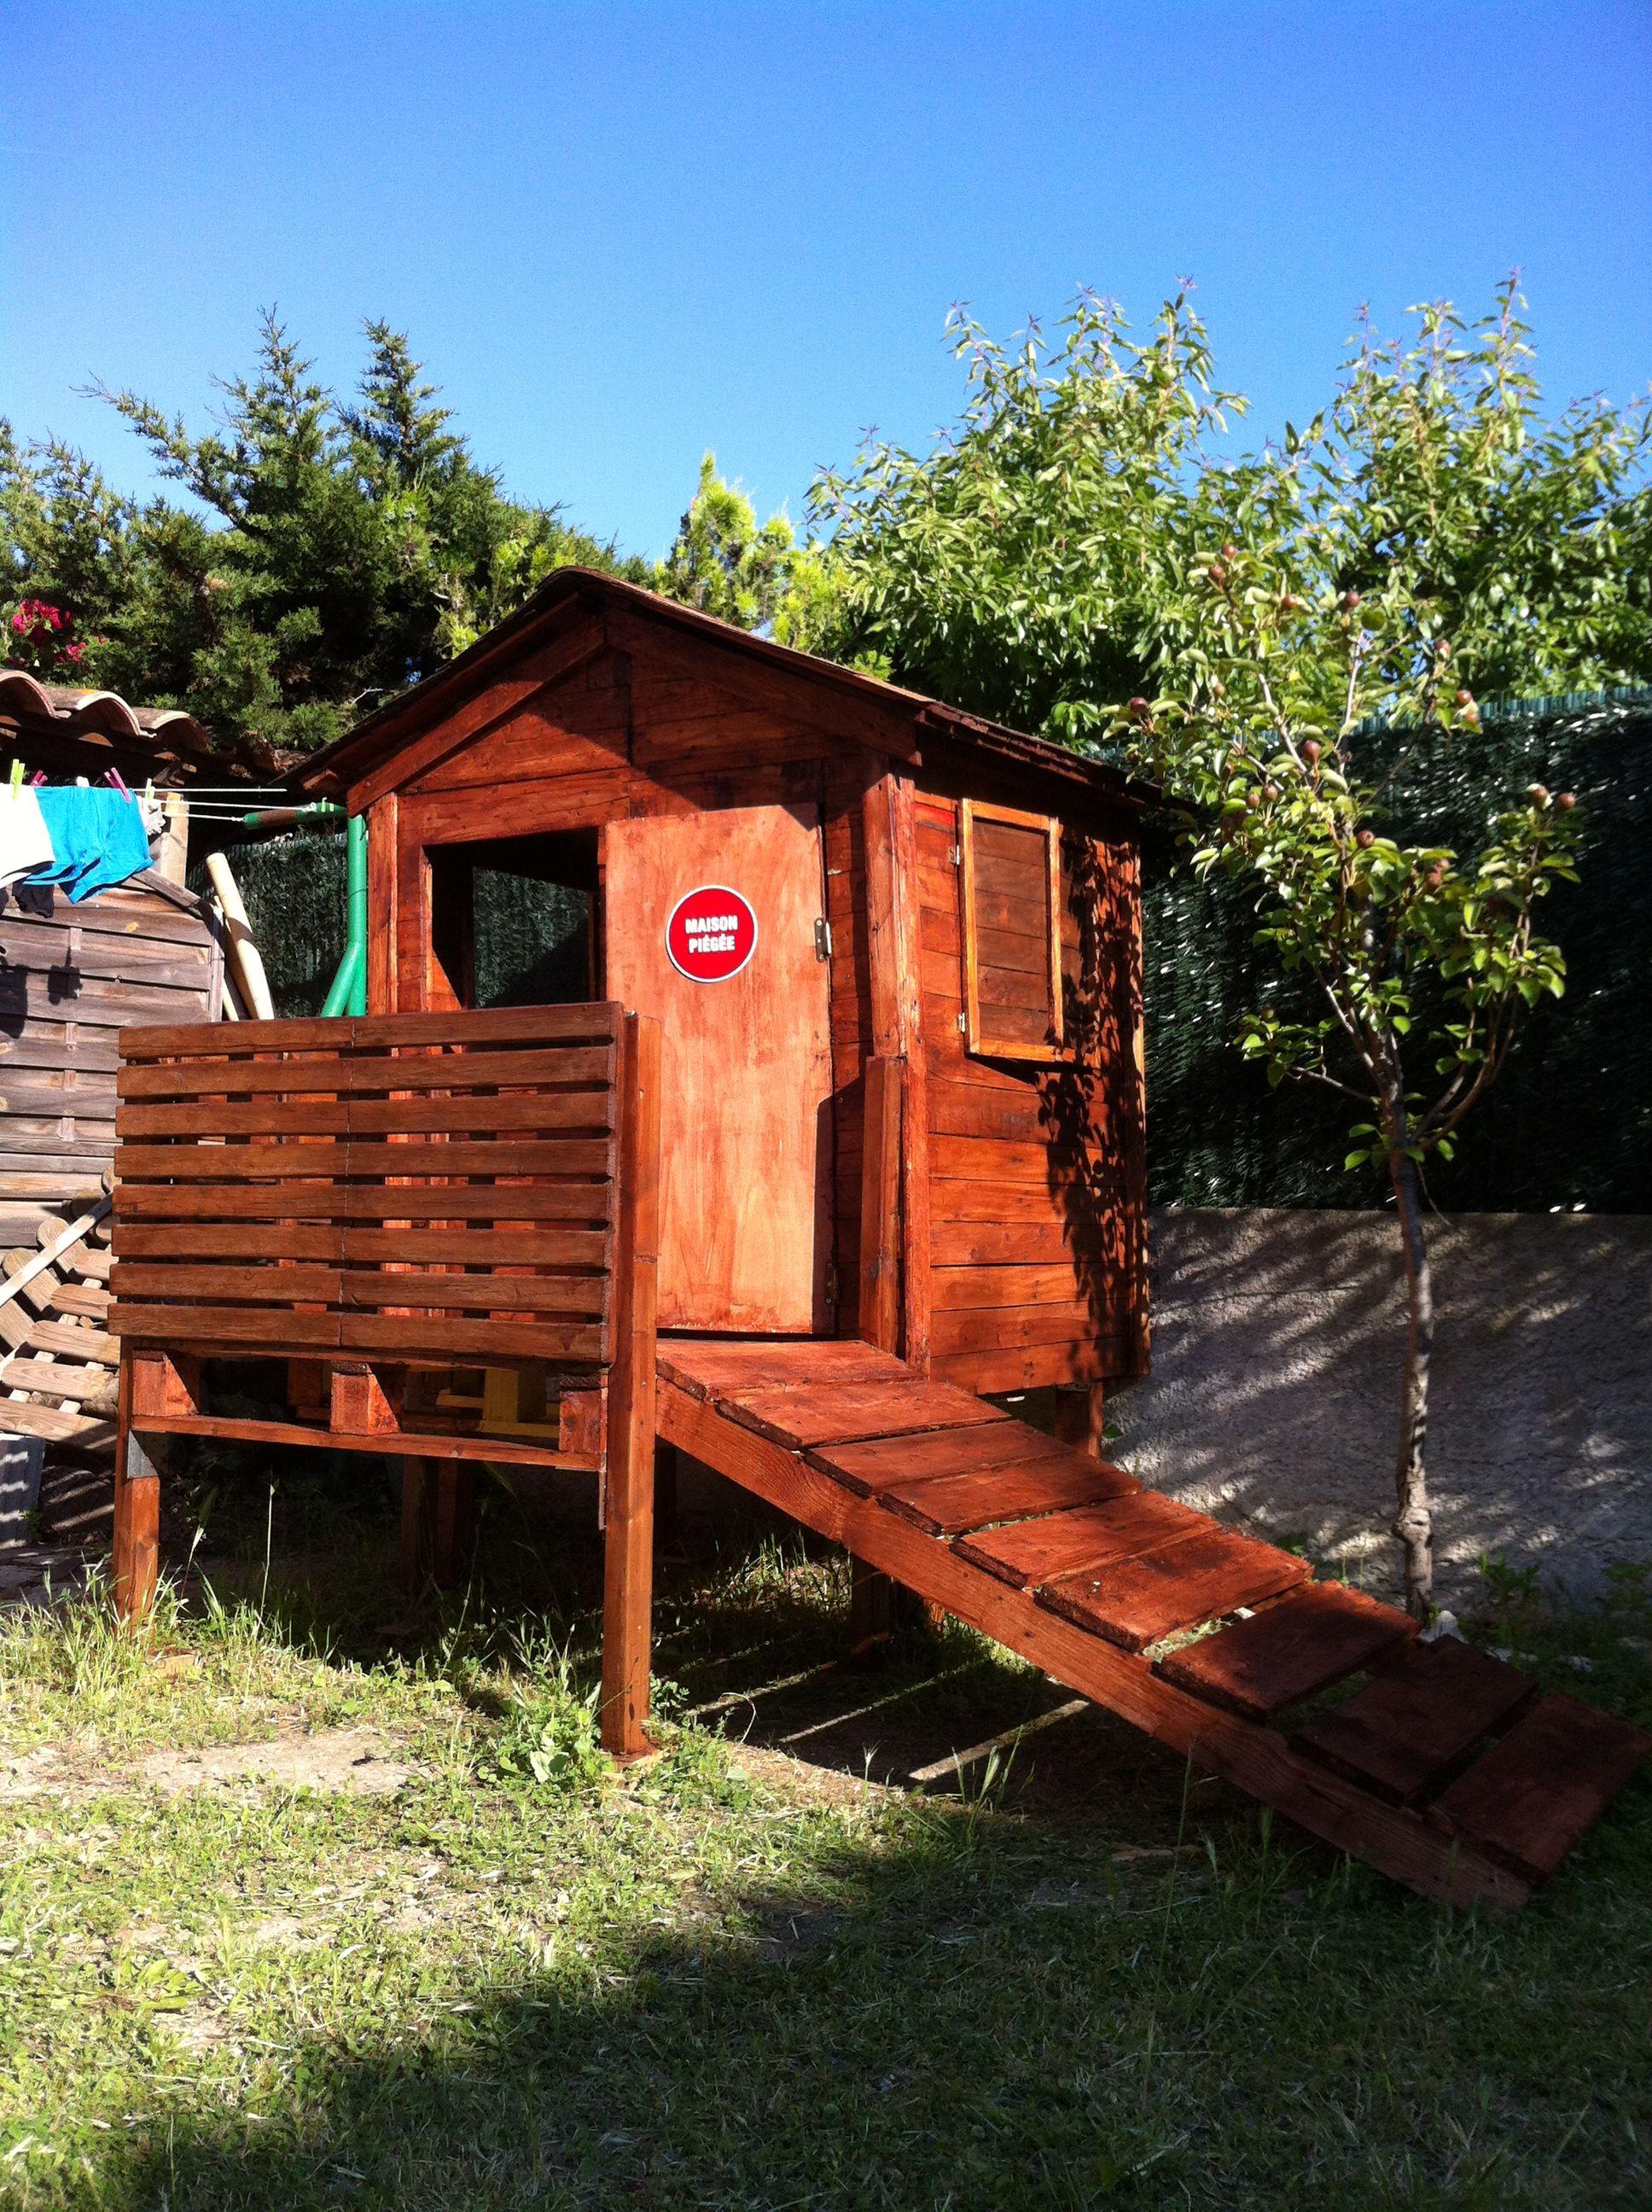 cabane en palettes cabane de bois cabane bois de palette. Black Bedroom Furniture Sets. Home Design Ideas